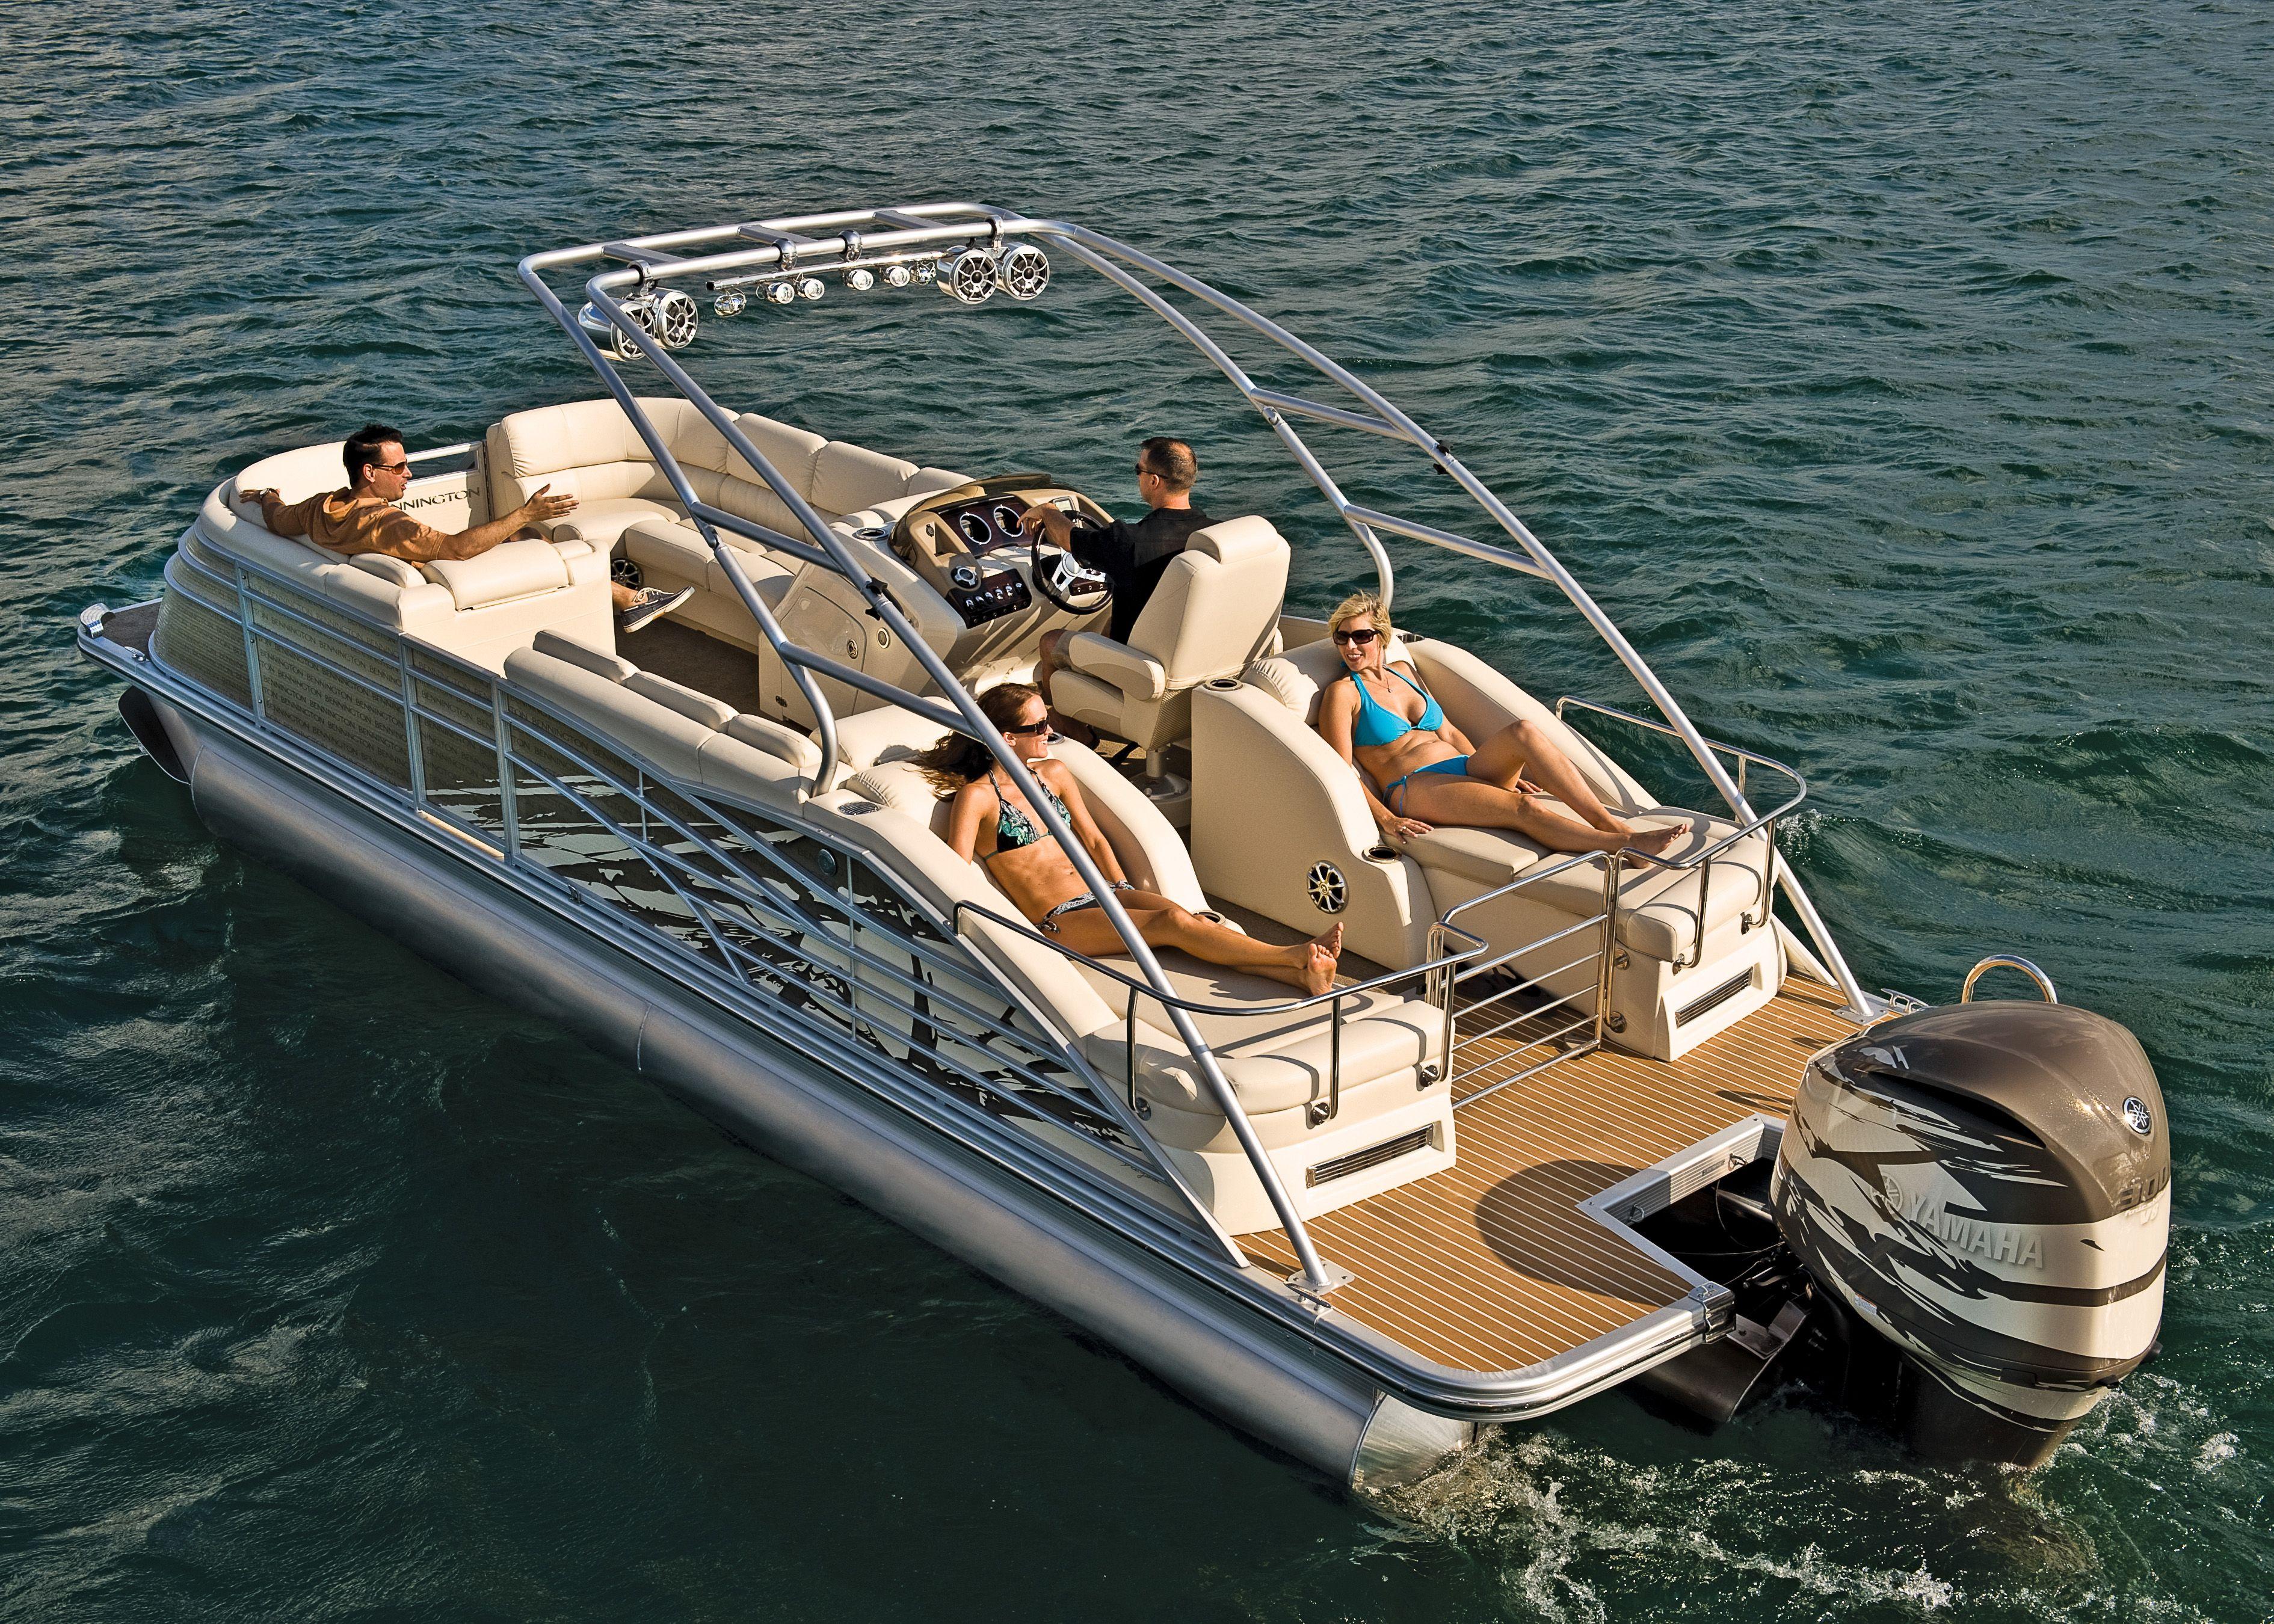 2012 bennington q25 pontoon boat from bennington pontoon great for sunnyday boating  [ 3780 x 2700 Pixel ]